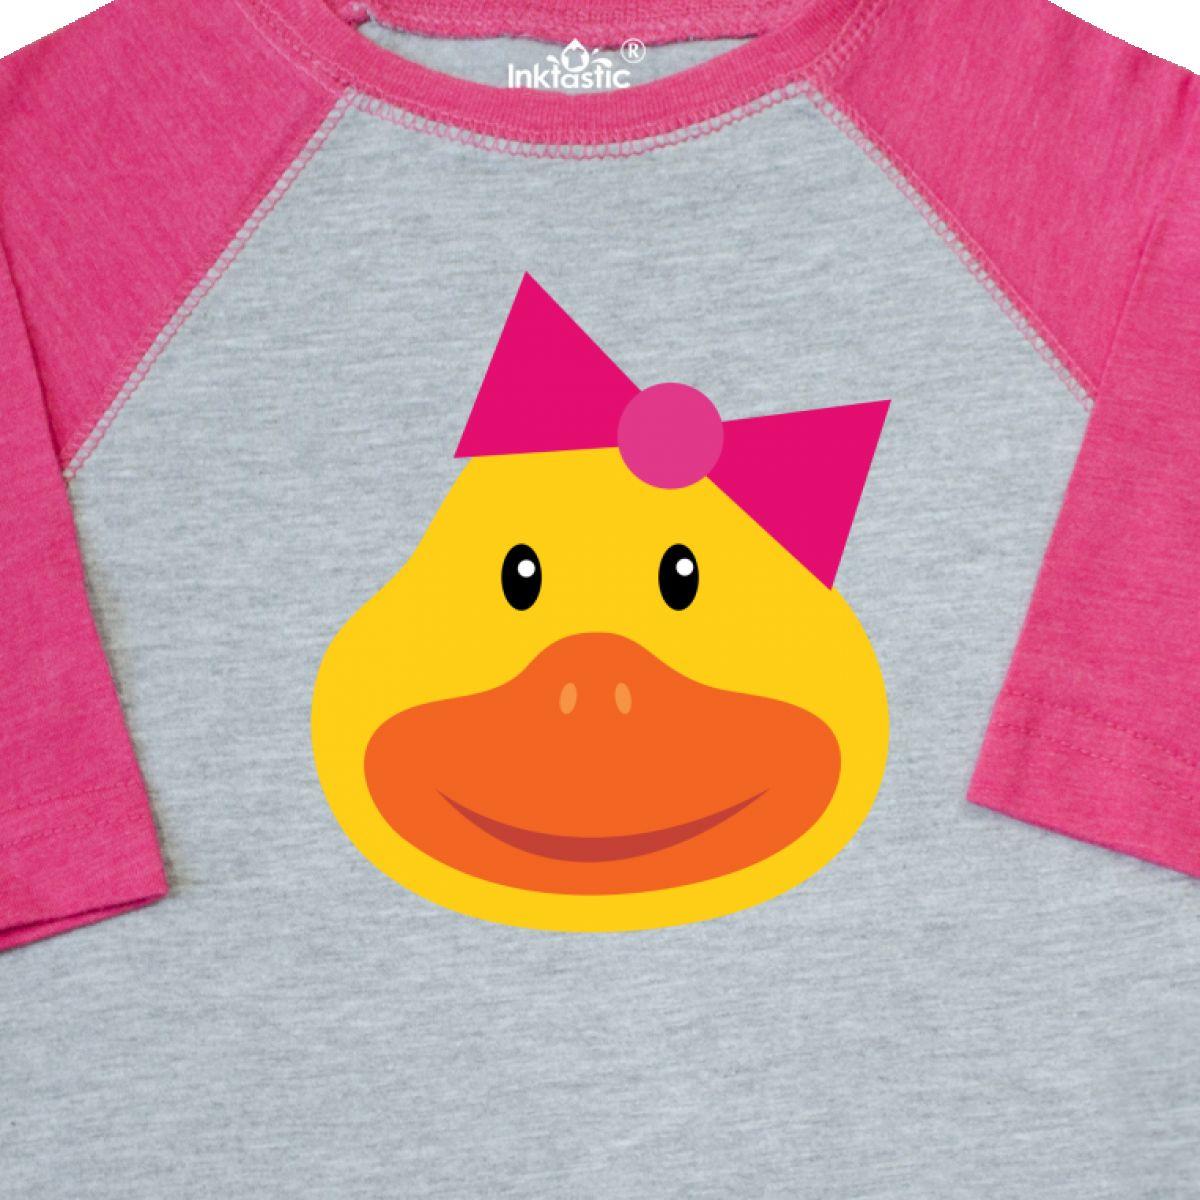 Inktastic Duck Girls Toddler T-Shirt Face Girl Cute Ducky Animals Birds Farm Kid